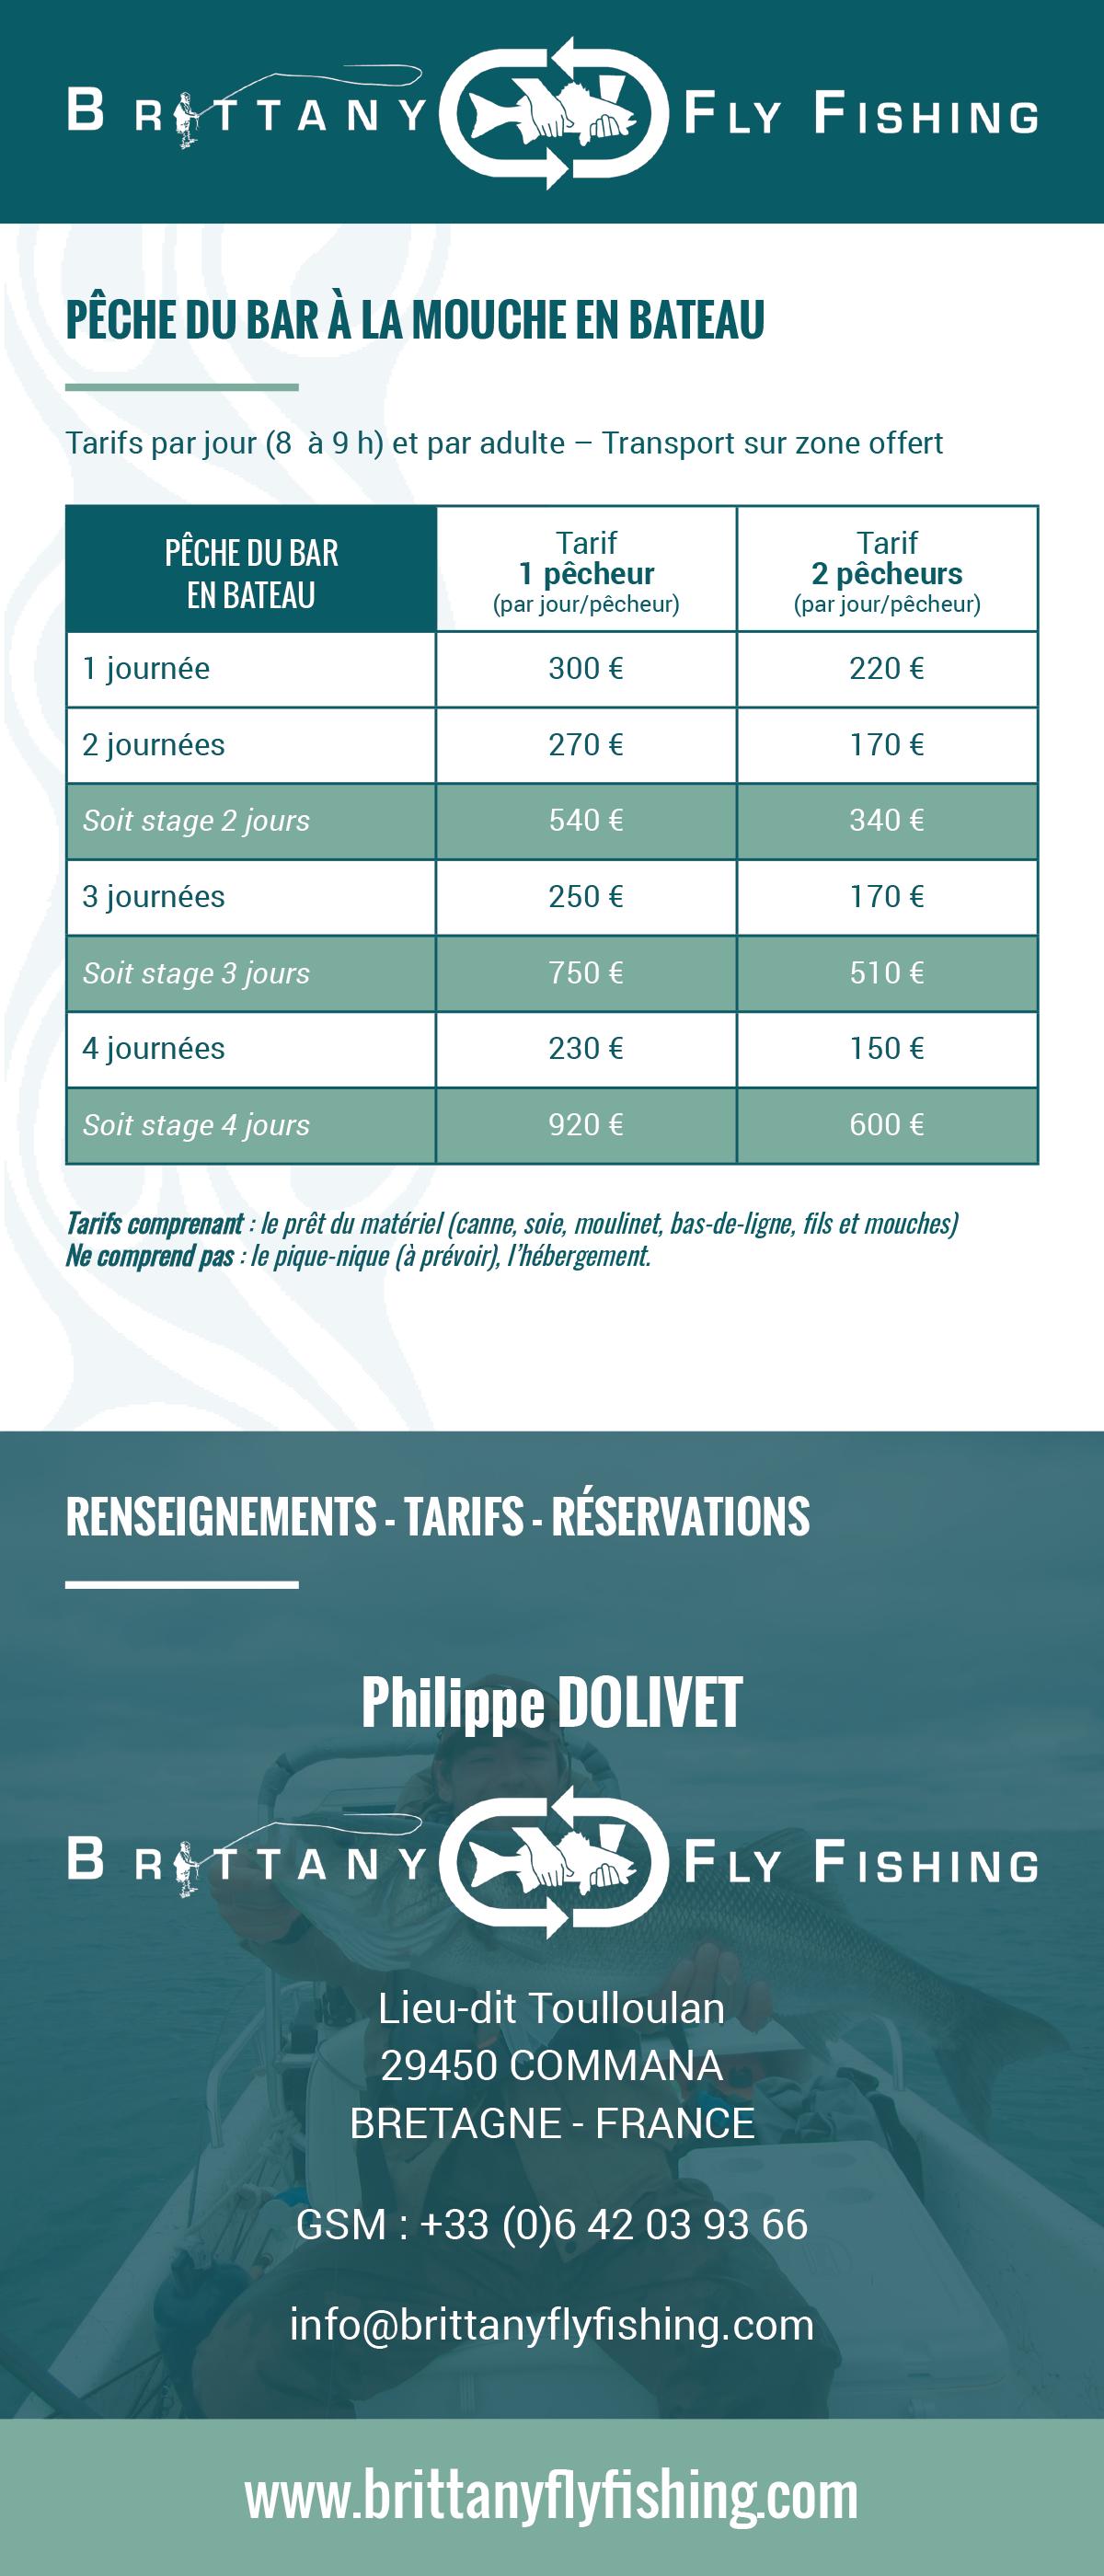 brittany-fly-fishing-tarifs-fr-2021-2